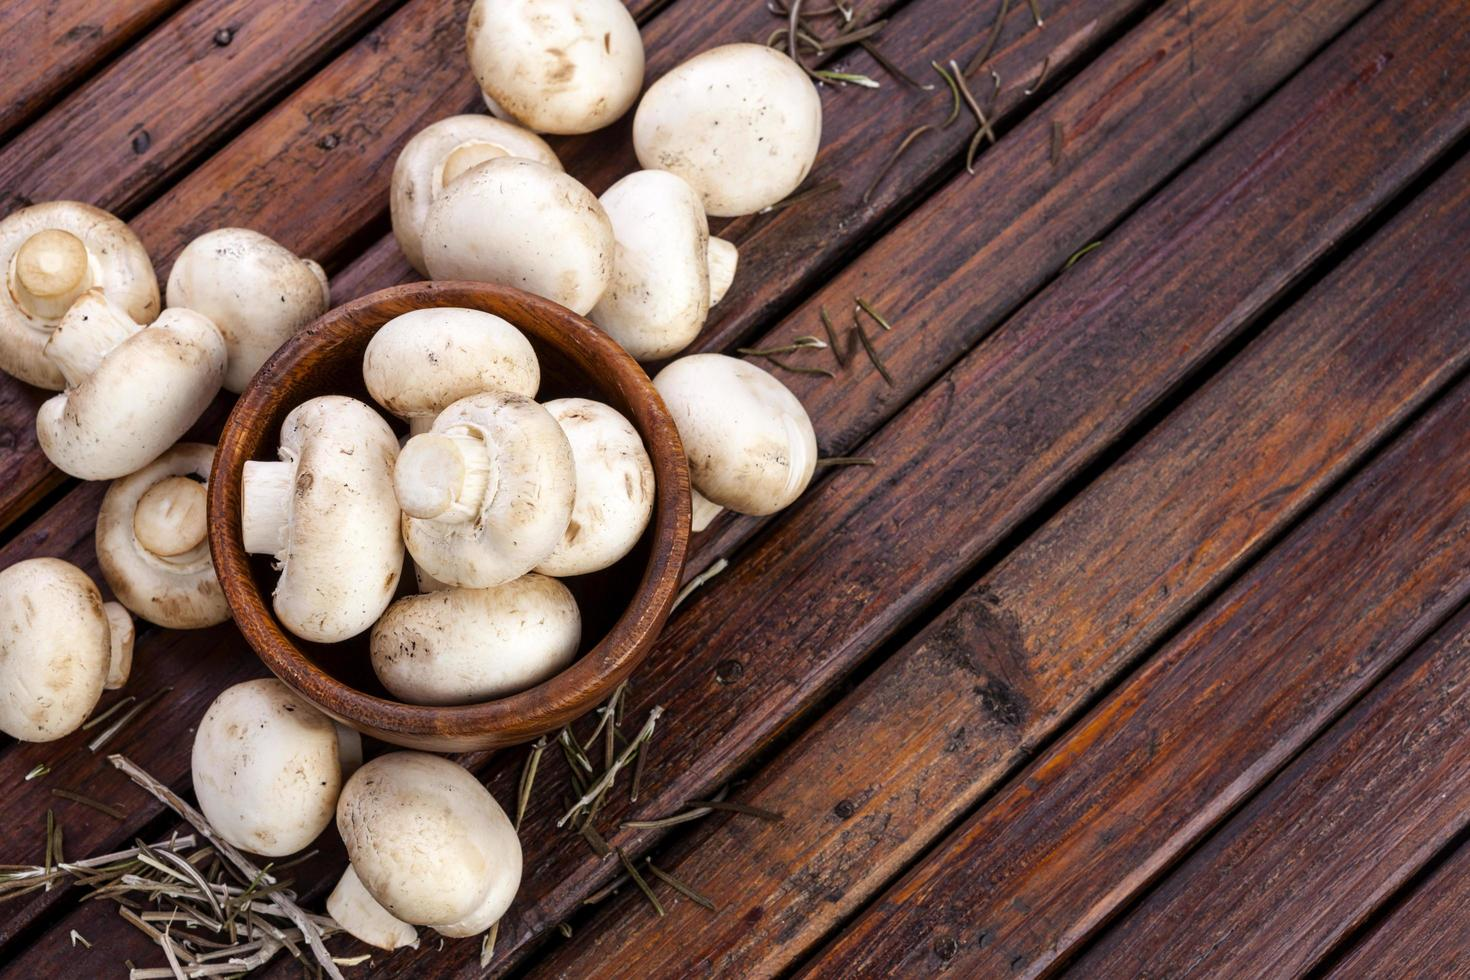 Mushroom heap on wood background photo